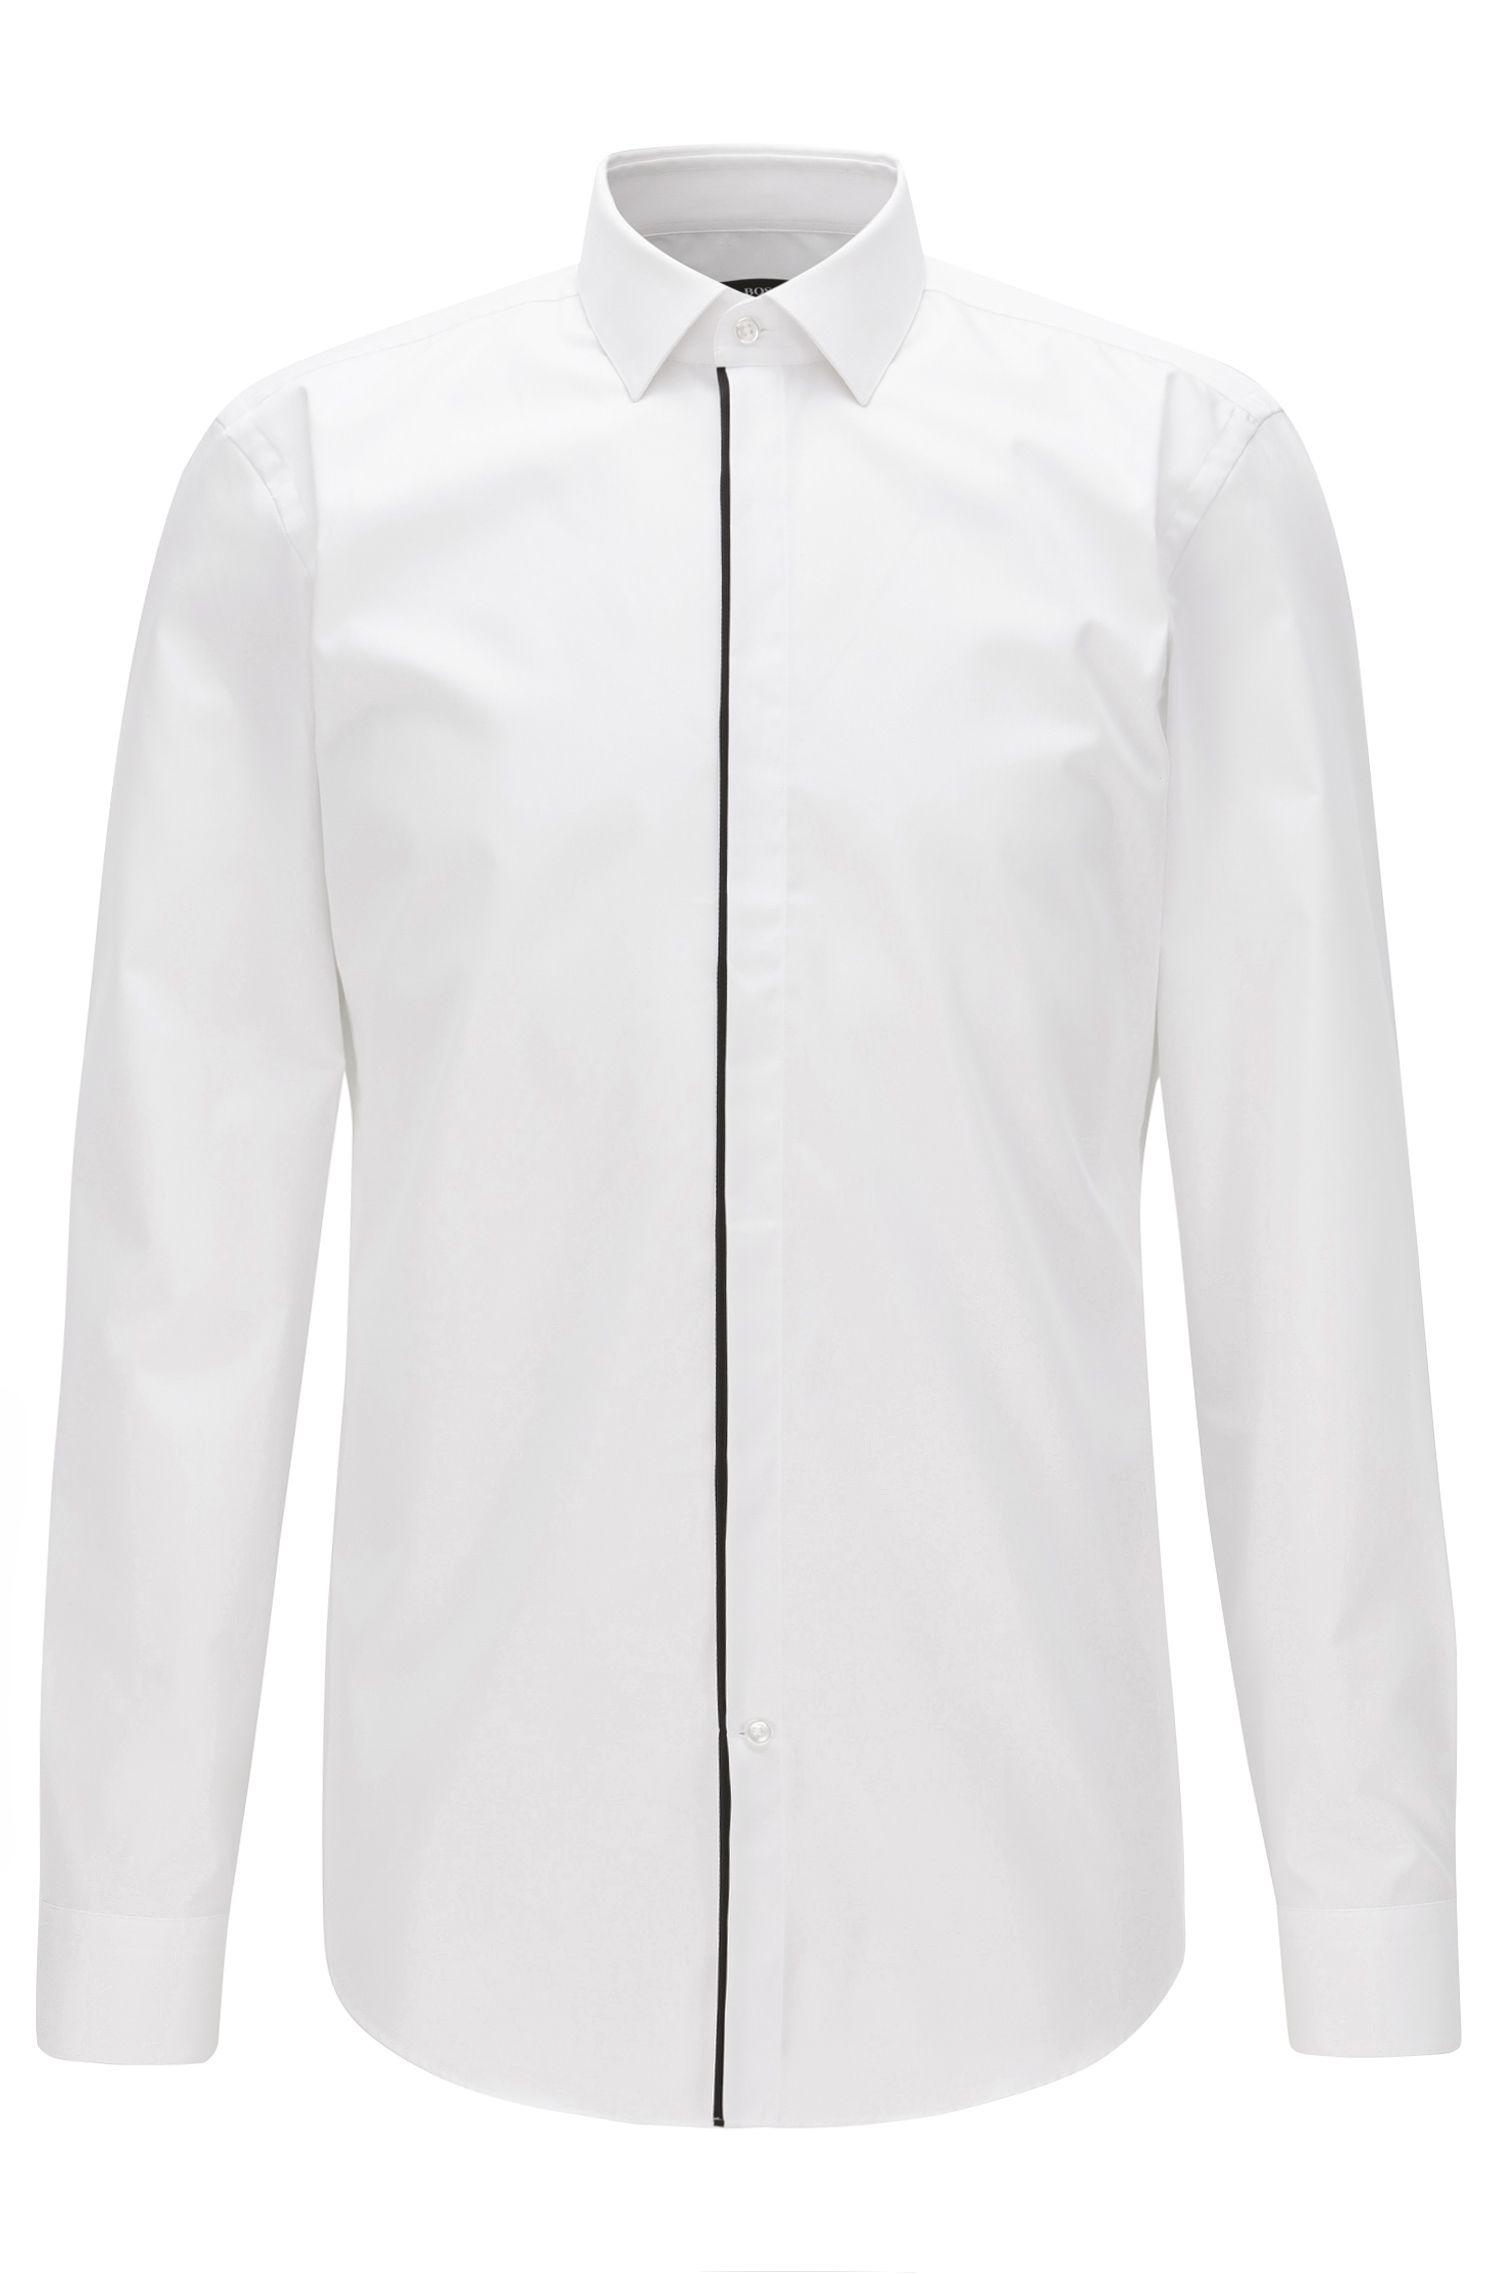 Piped Cotton Dress Shirt, Slim Fit | Jamis